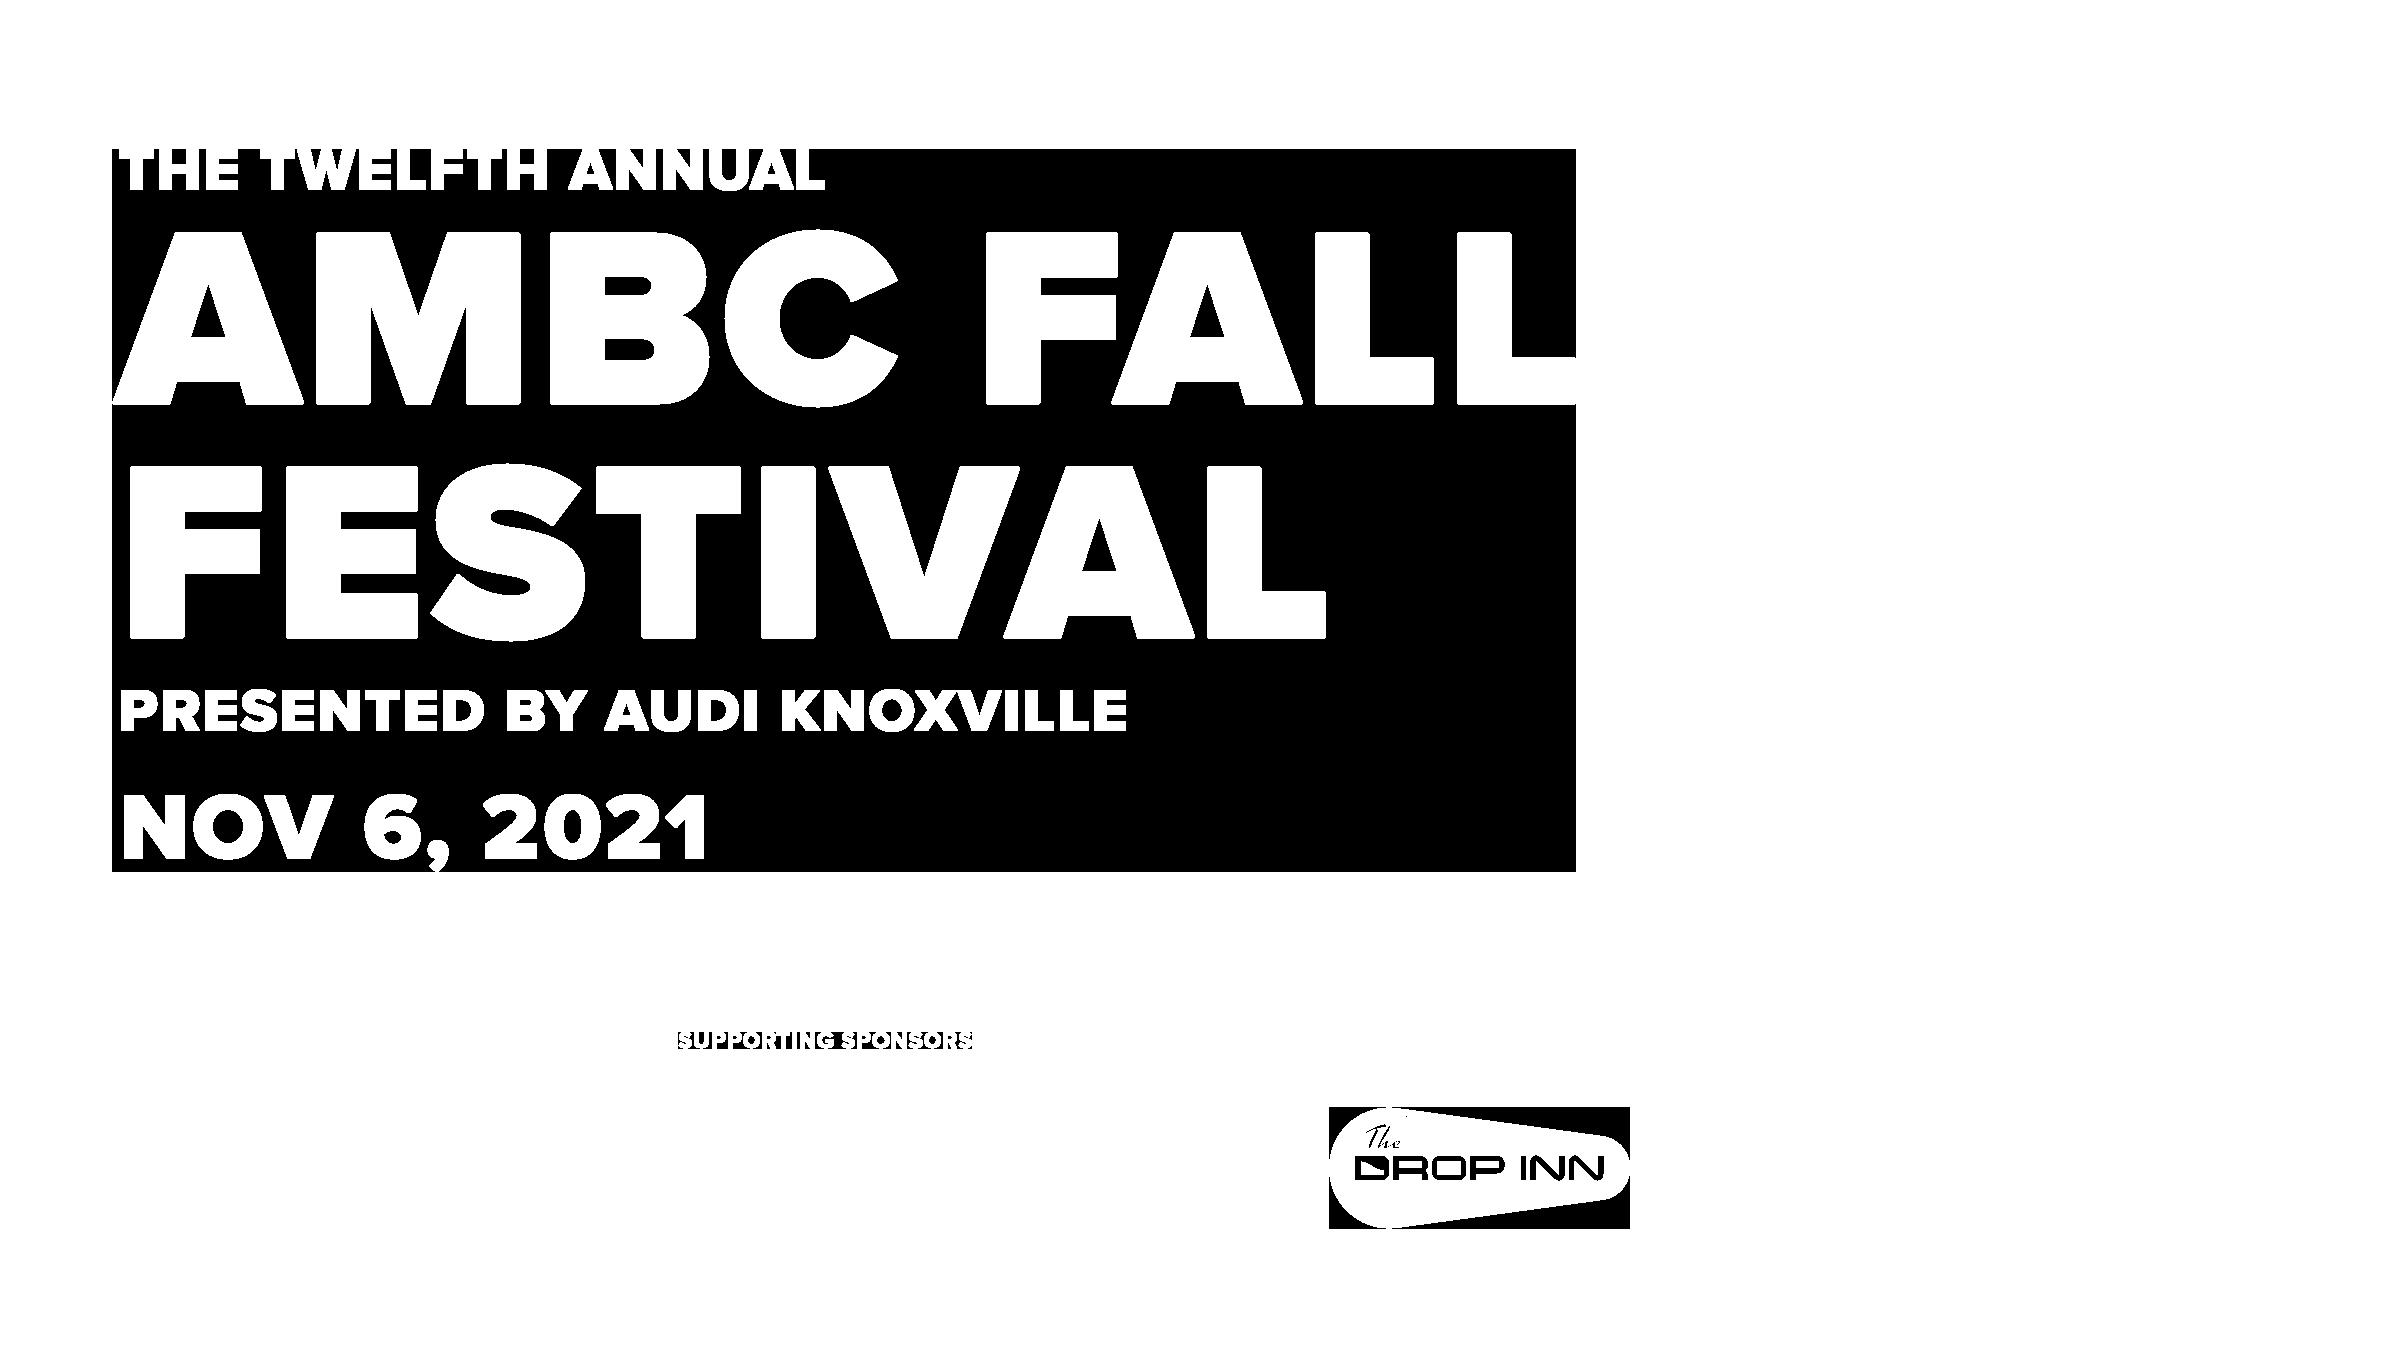 12th Annual AMBC Fall Festival